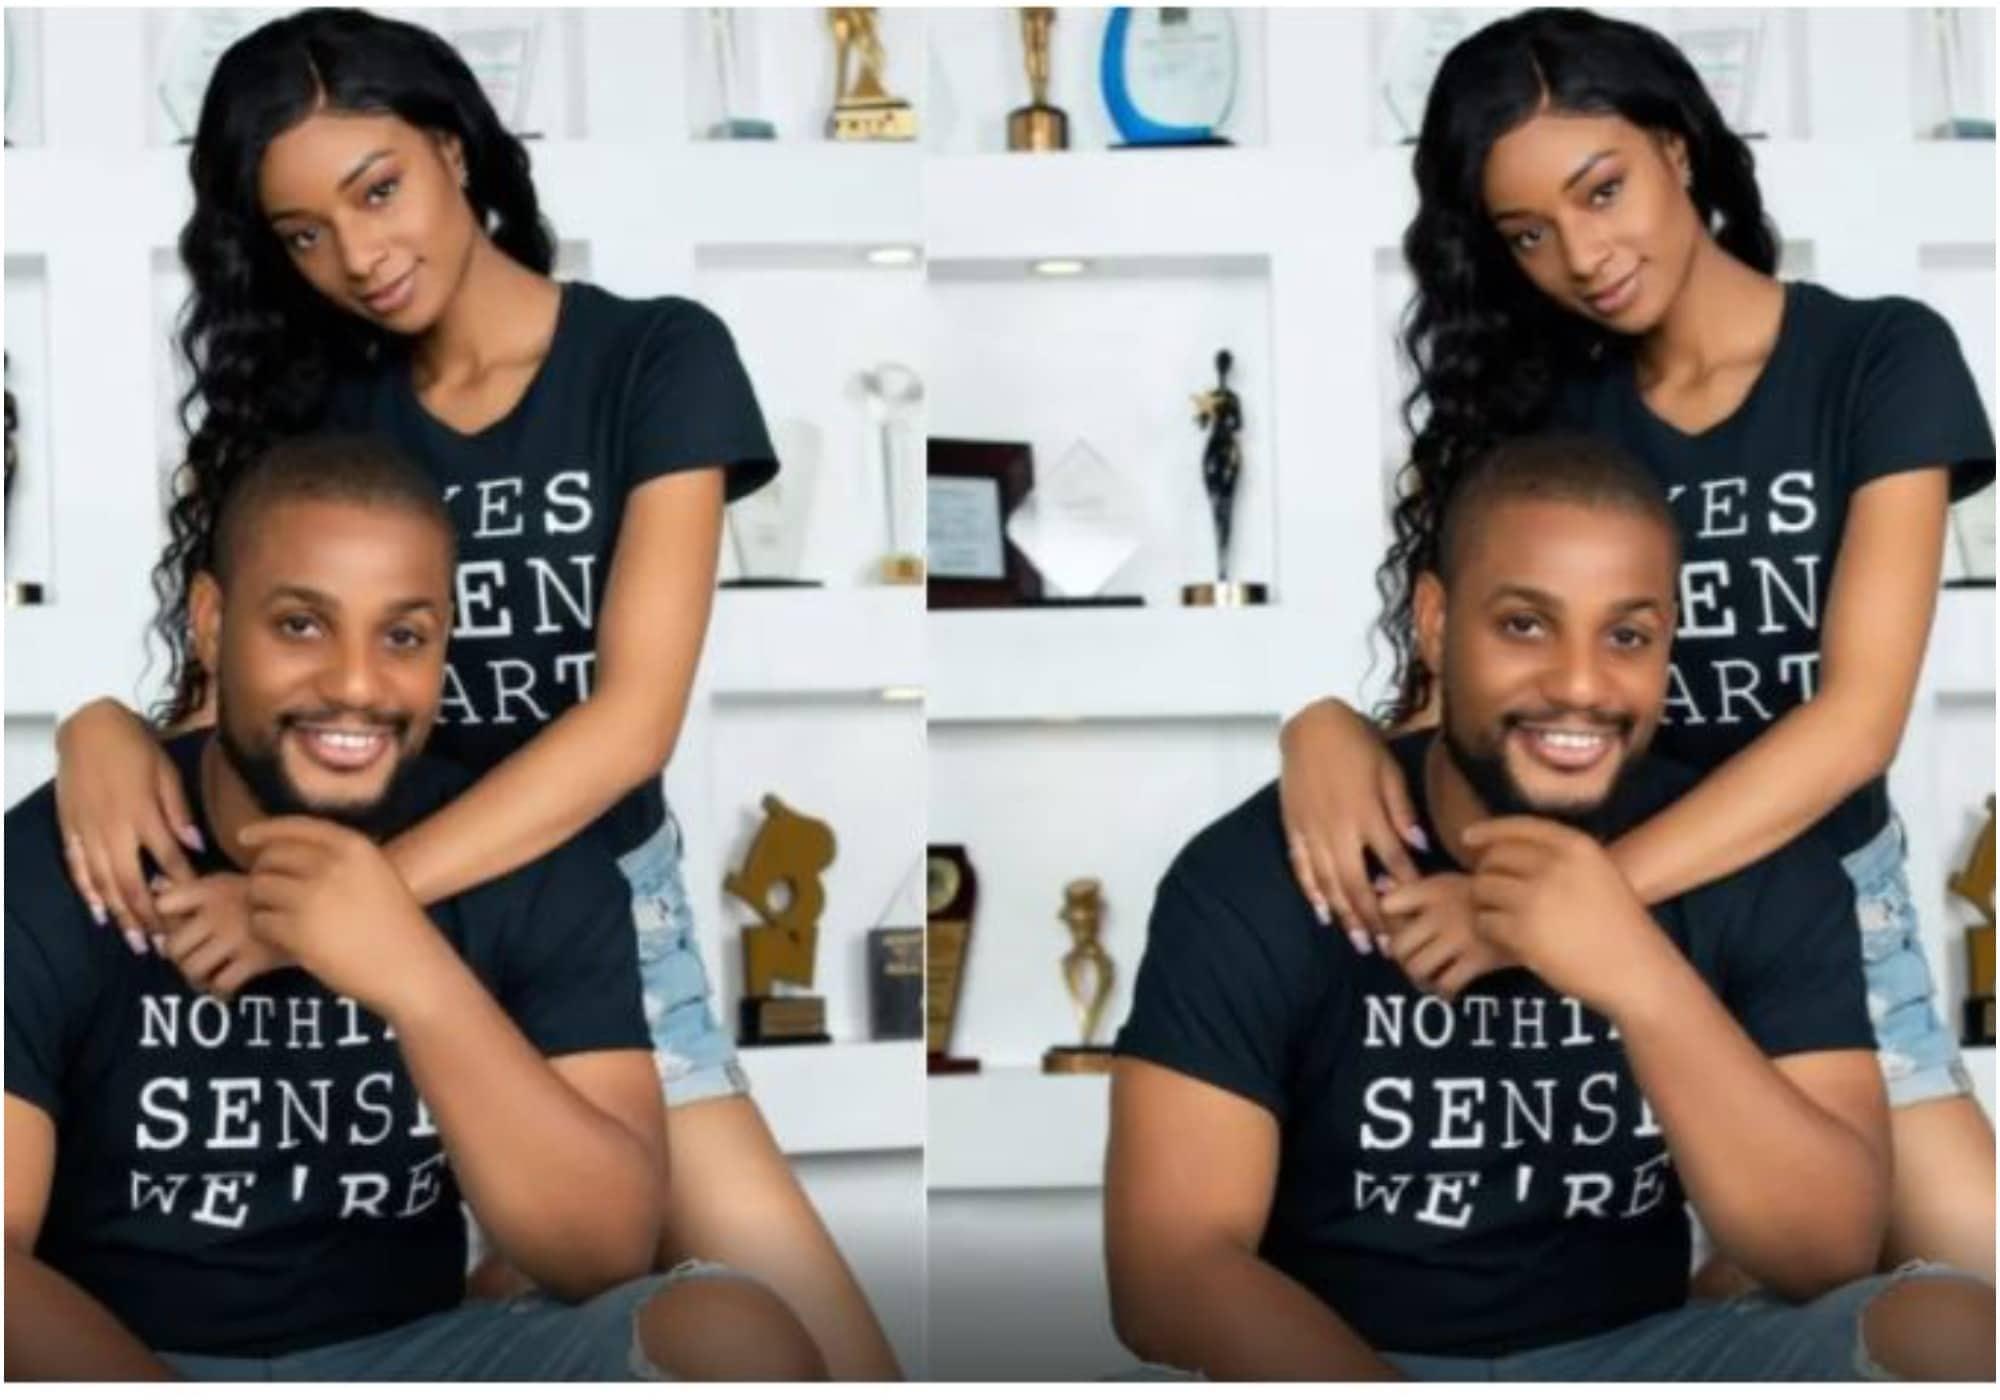 Alex Ekubo and fiancee sparks relationship break up